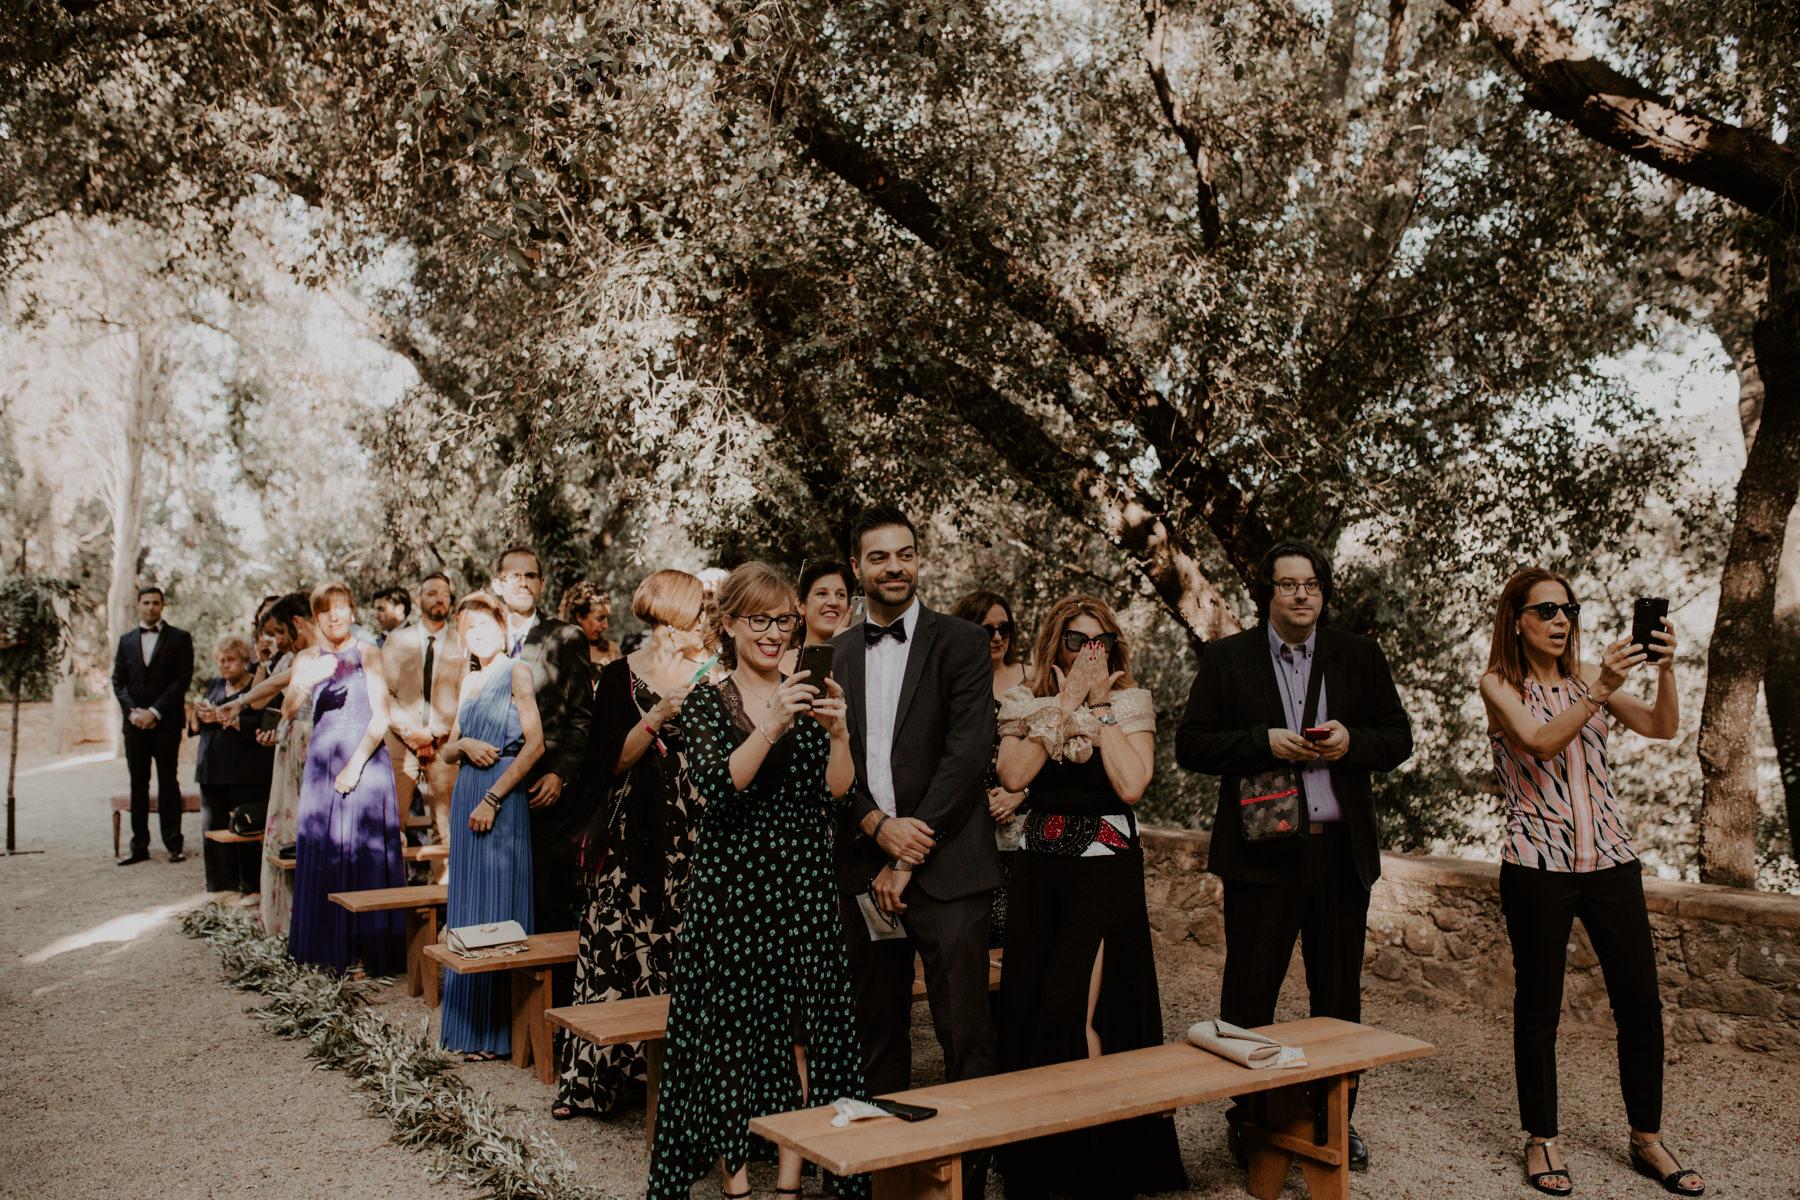 alt_thenortherngirlphotography_couples_weddingphotographer_photographer_wedding_boda_fotografodebodas_fotografobodasbarcelona_bodaindie_bodasconestilo_bodaensantperedeclara_jennifermiguel-282.jpg